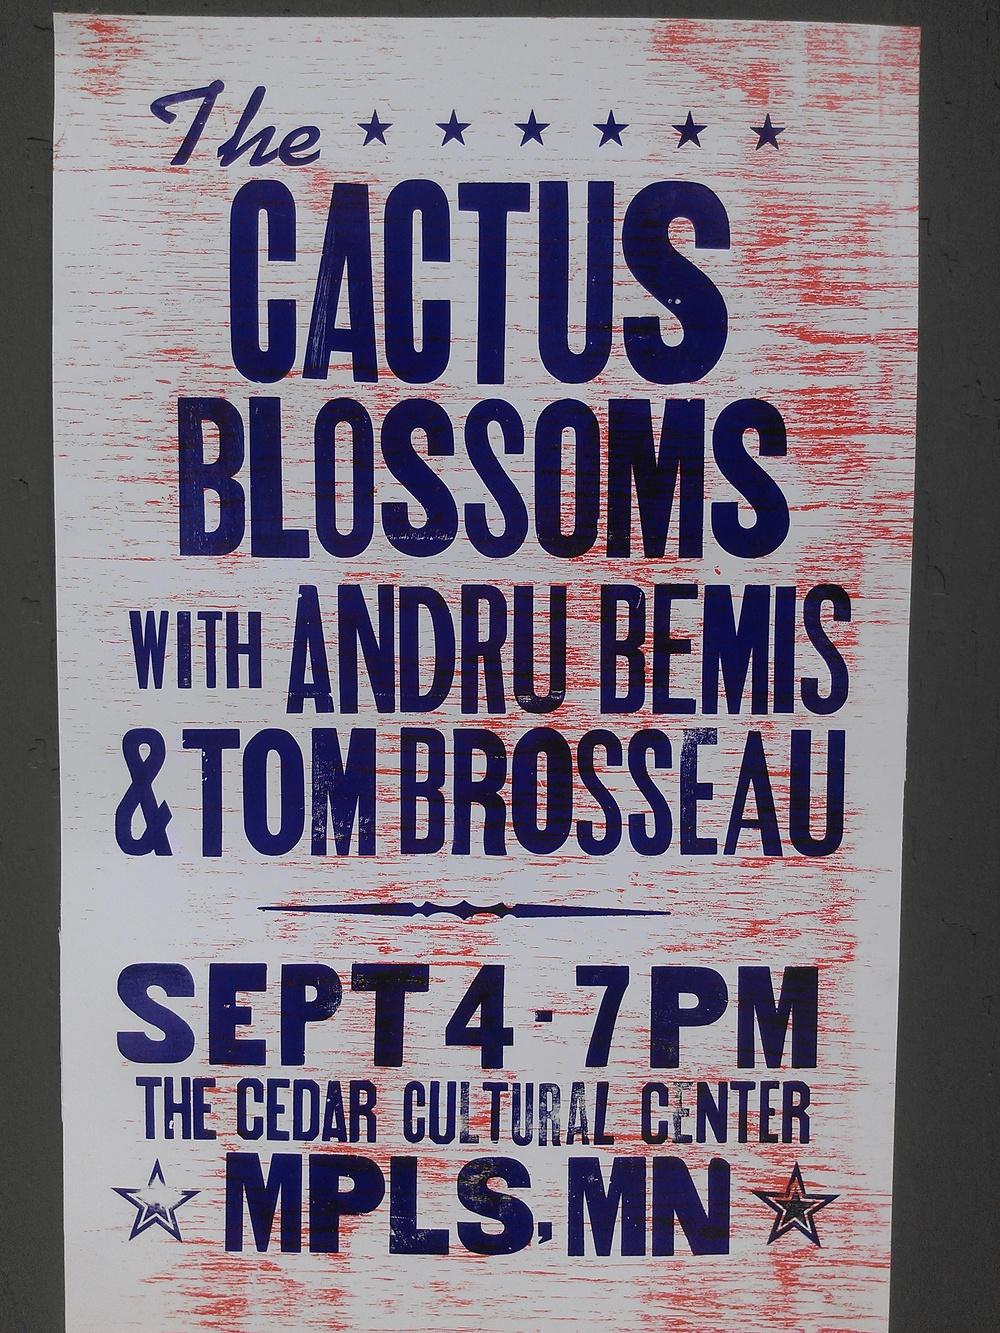 cactus-blossoms.jpg